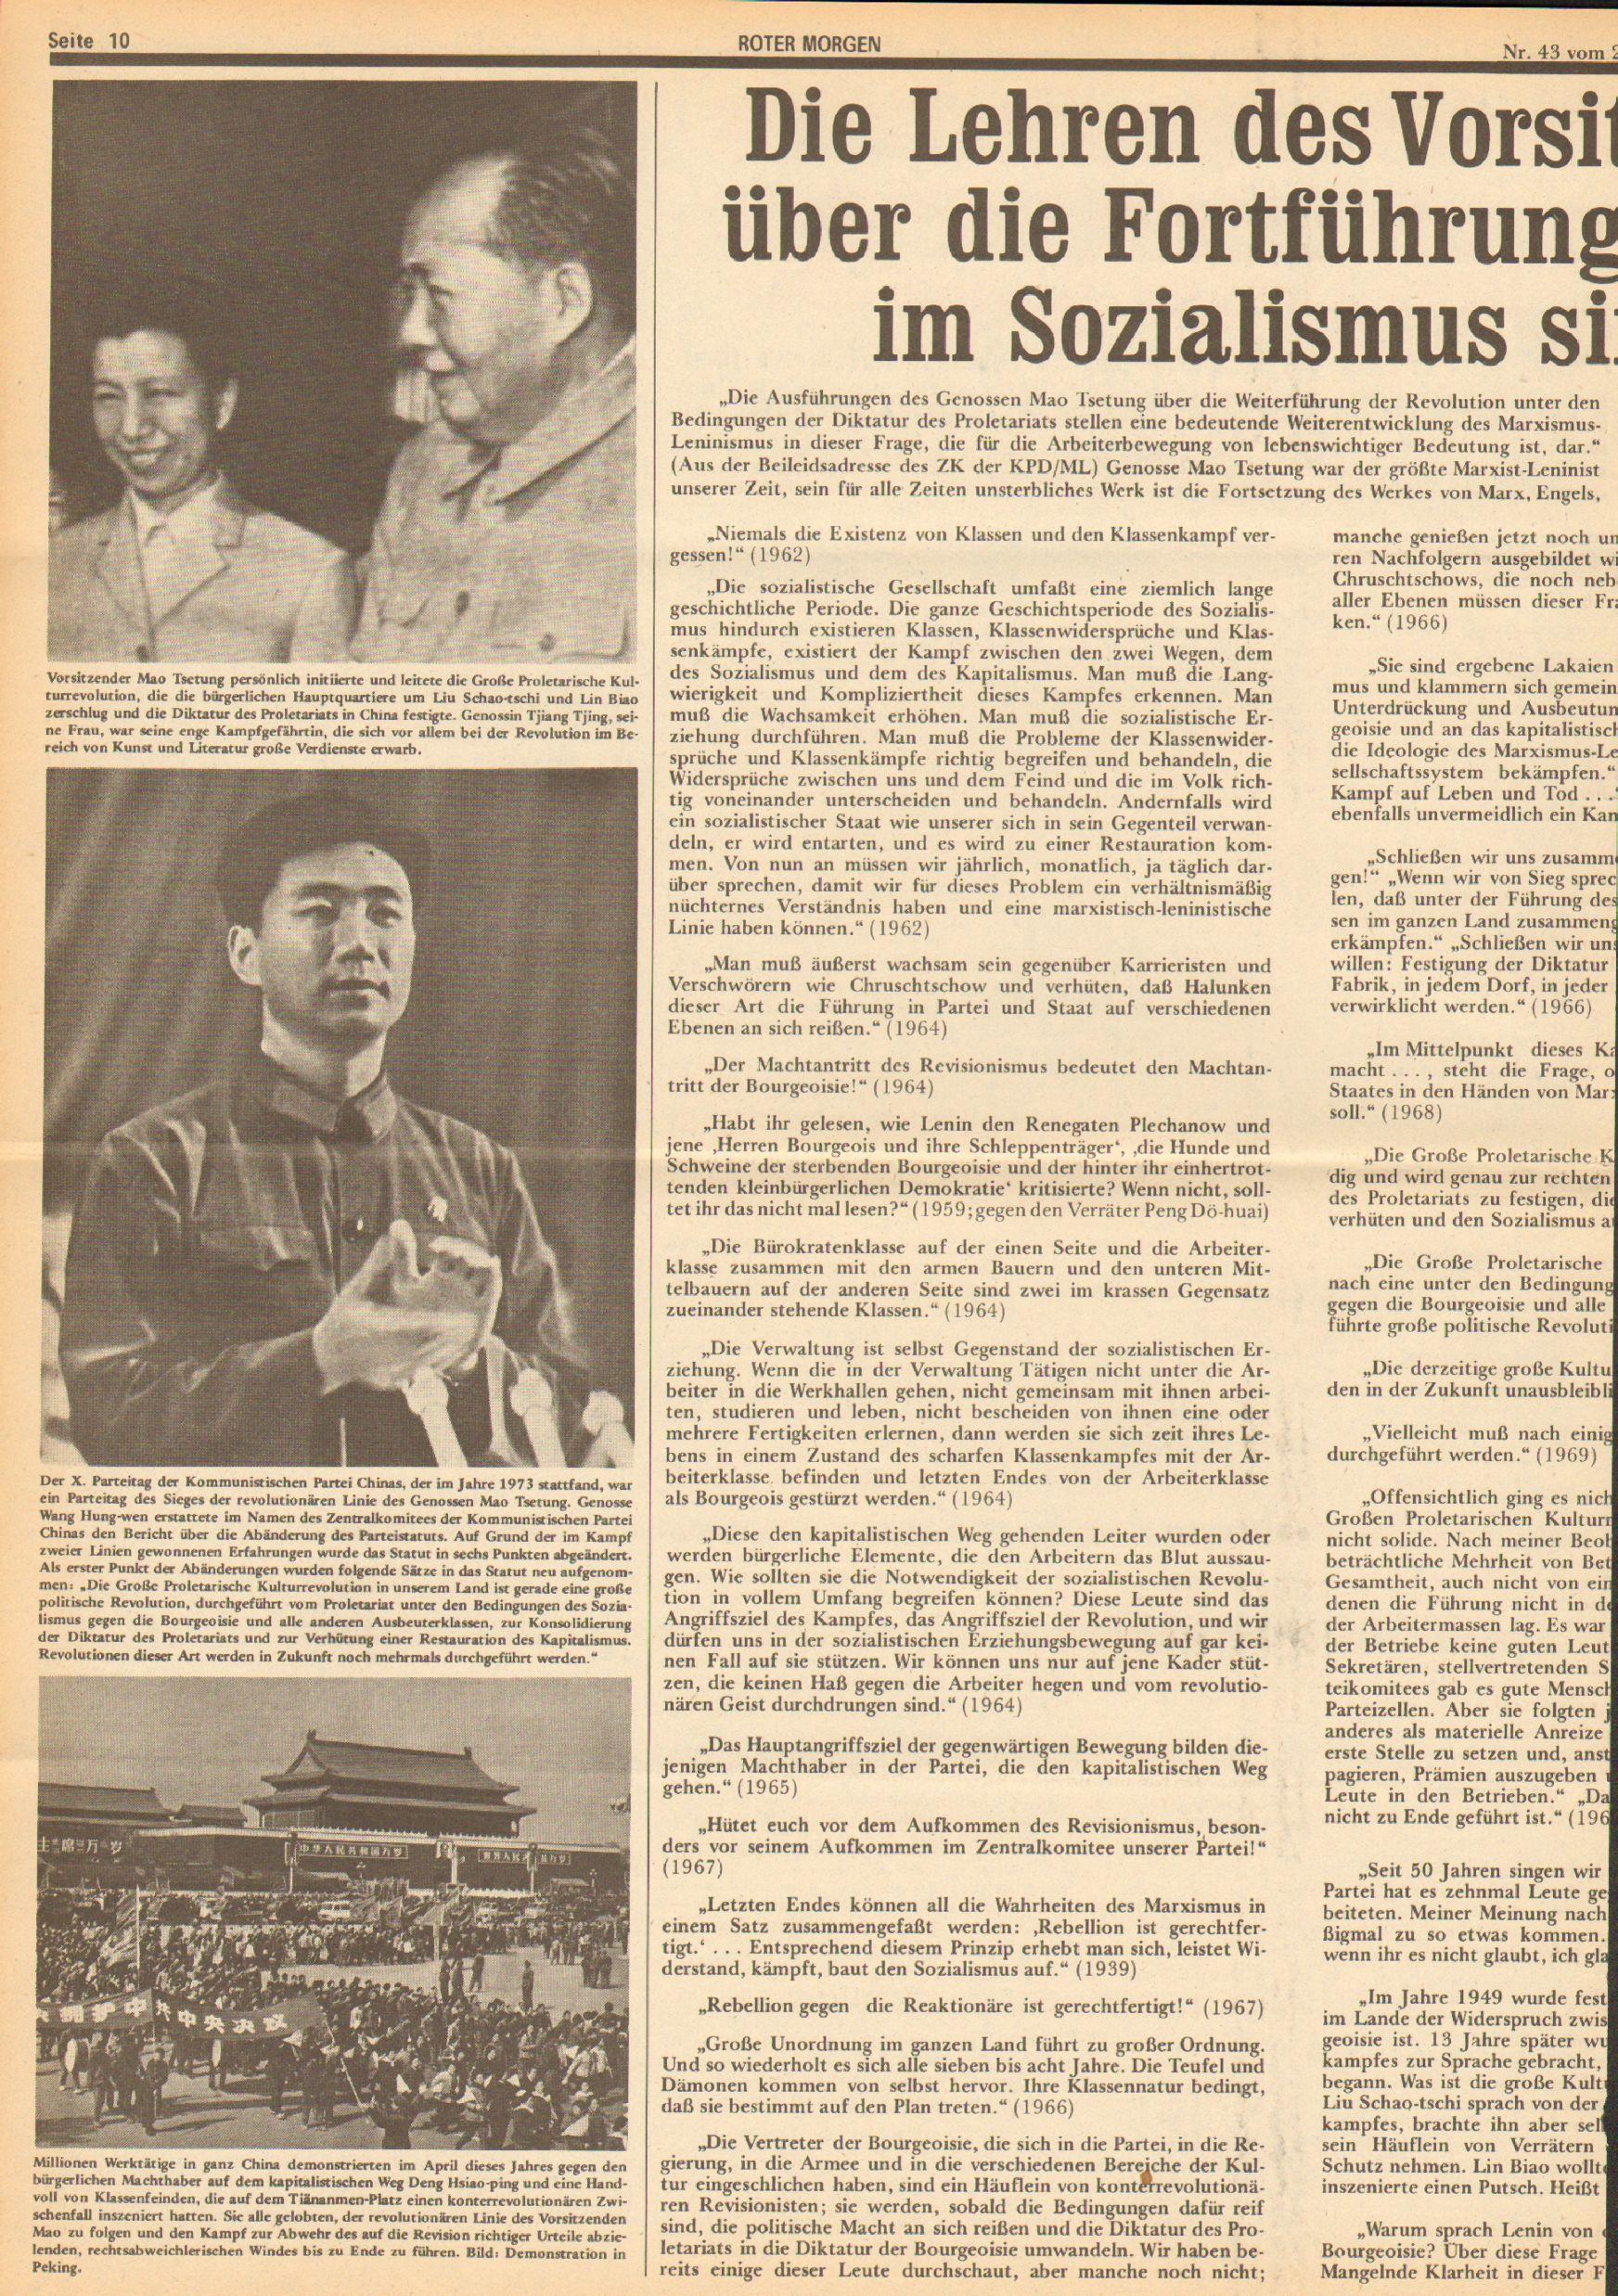 Roter Morgen, 10. Jg., 23. Oktober 1976, Nr. 43, Seite 10